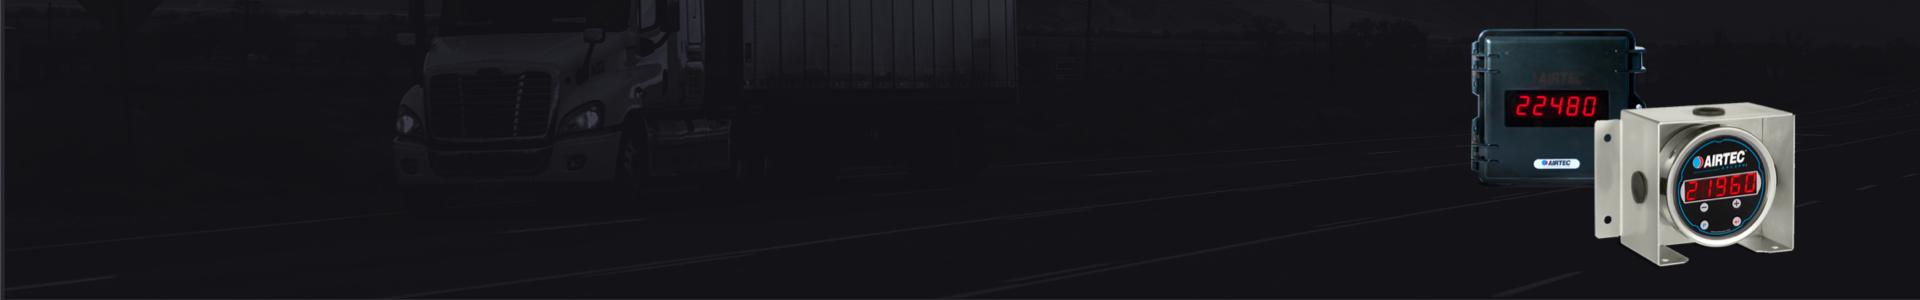 Subheader image - Airtec Digital Truck Scales AXL Series